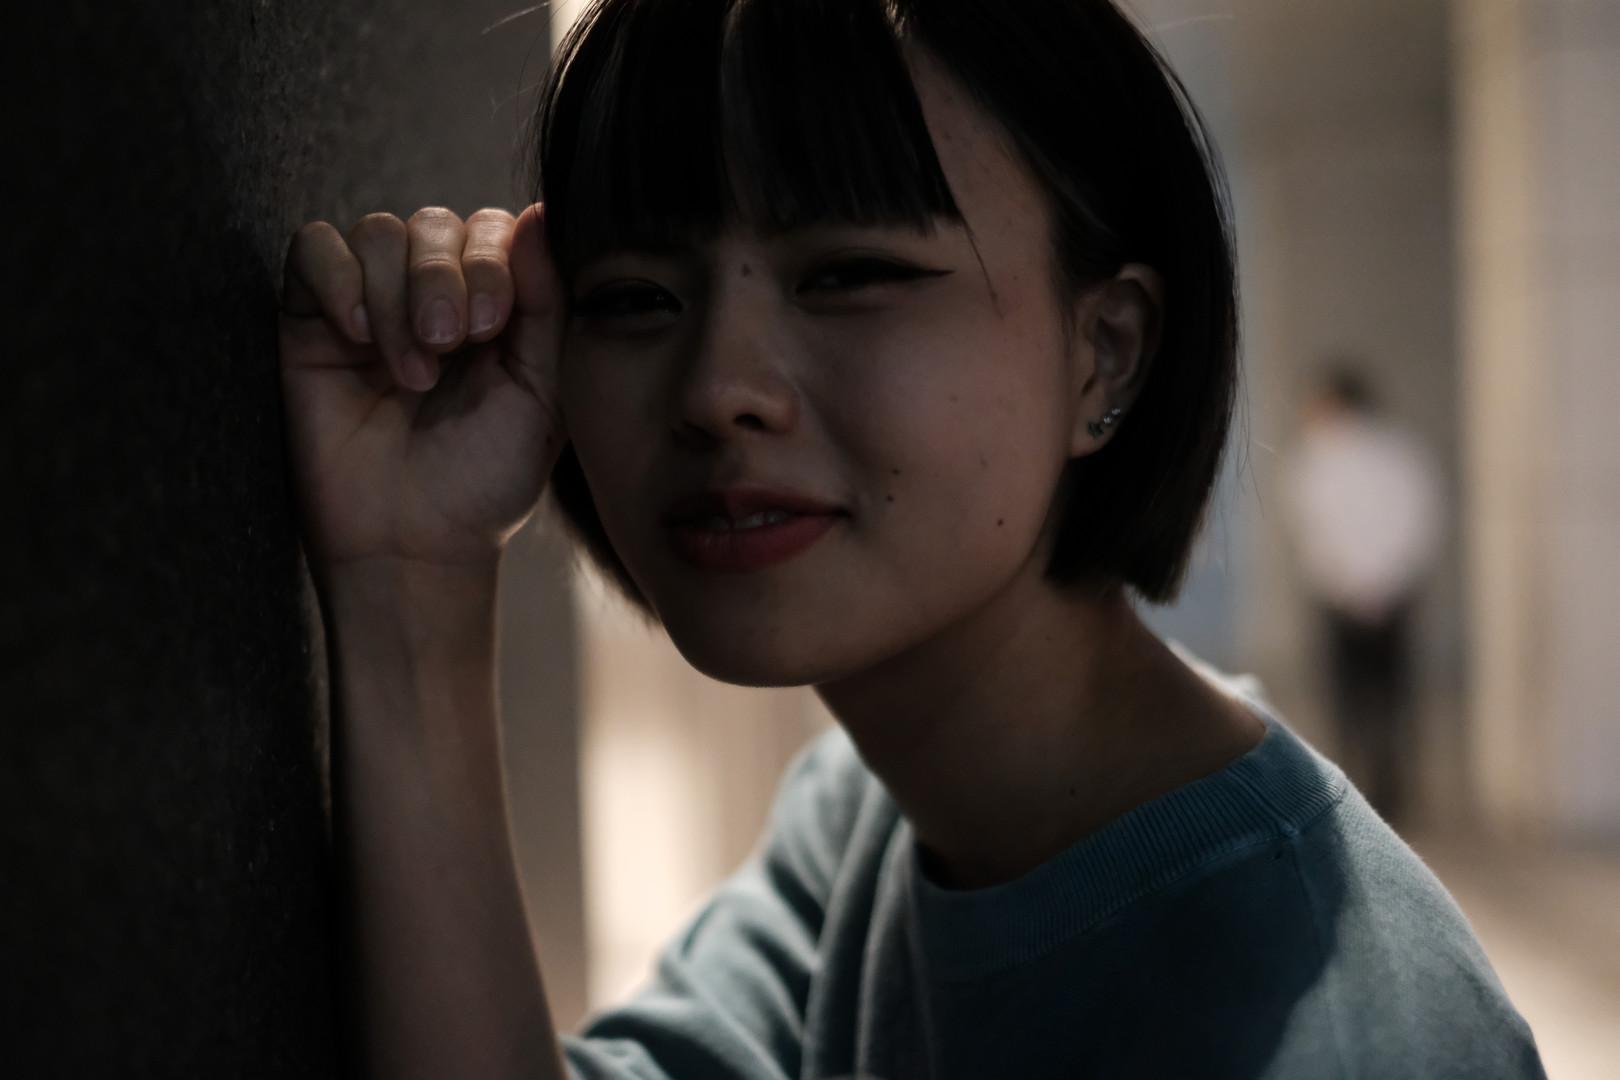 永田姫加 -Himeka Nagata-